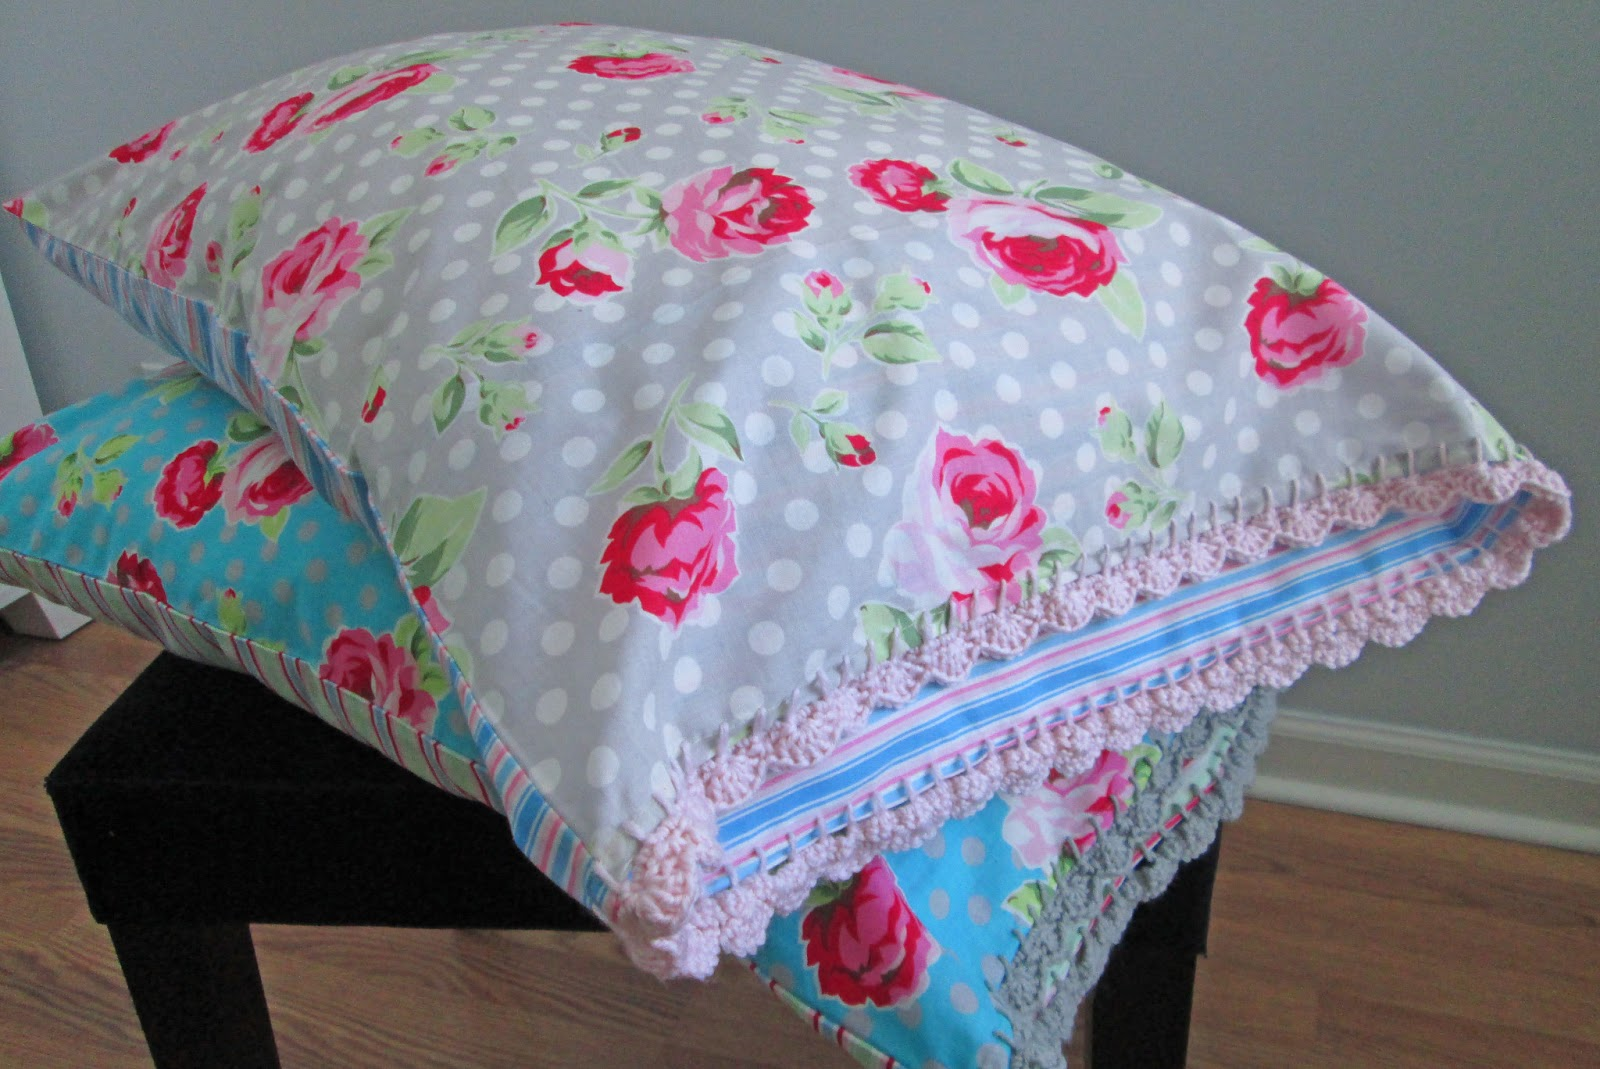 S.o.t.a.k Handmade: Crochet Edge Pillow Covers {take Two}